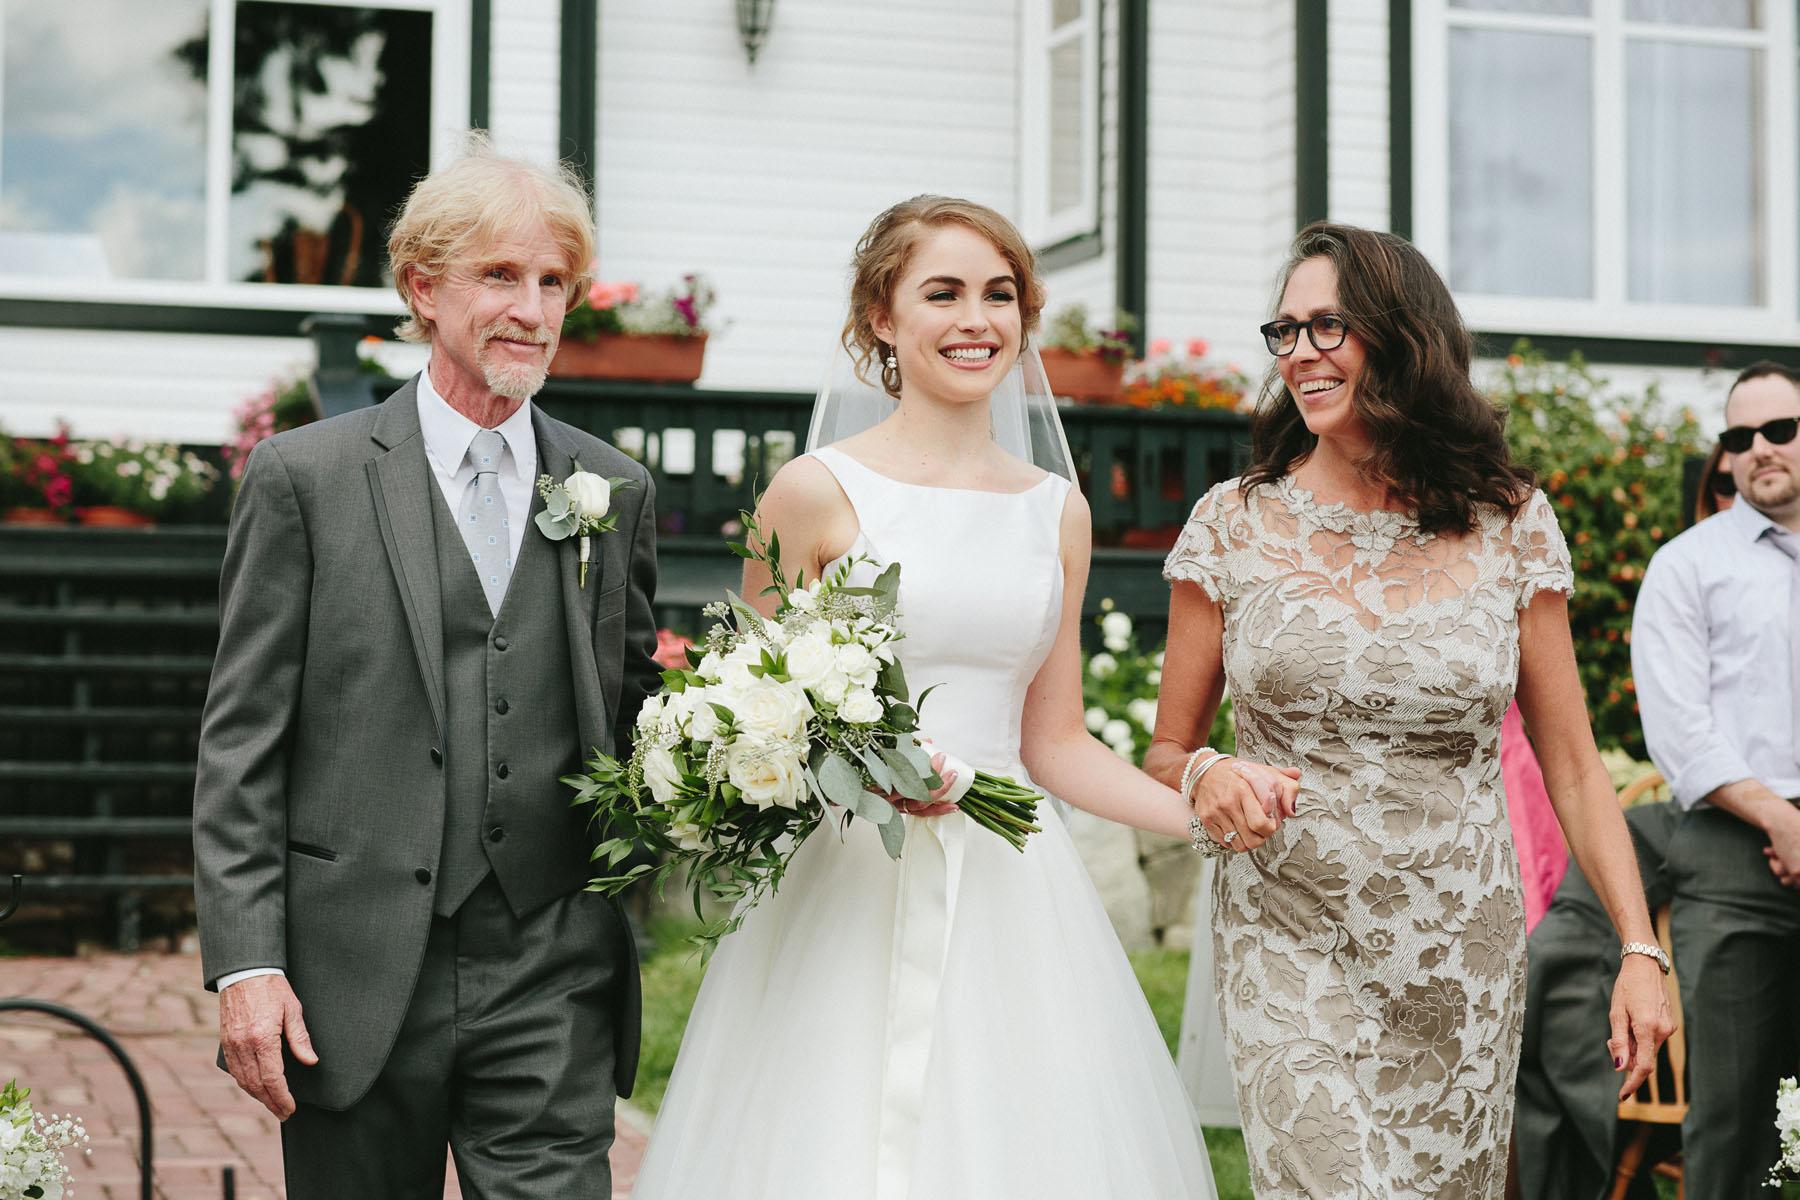 thetis-island-wedding-photographer-rp-rn-073.jpg